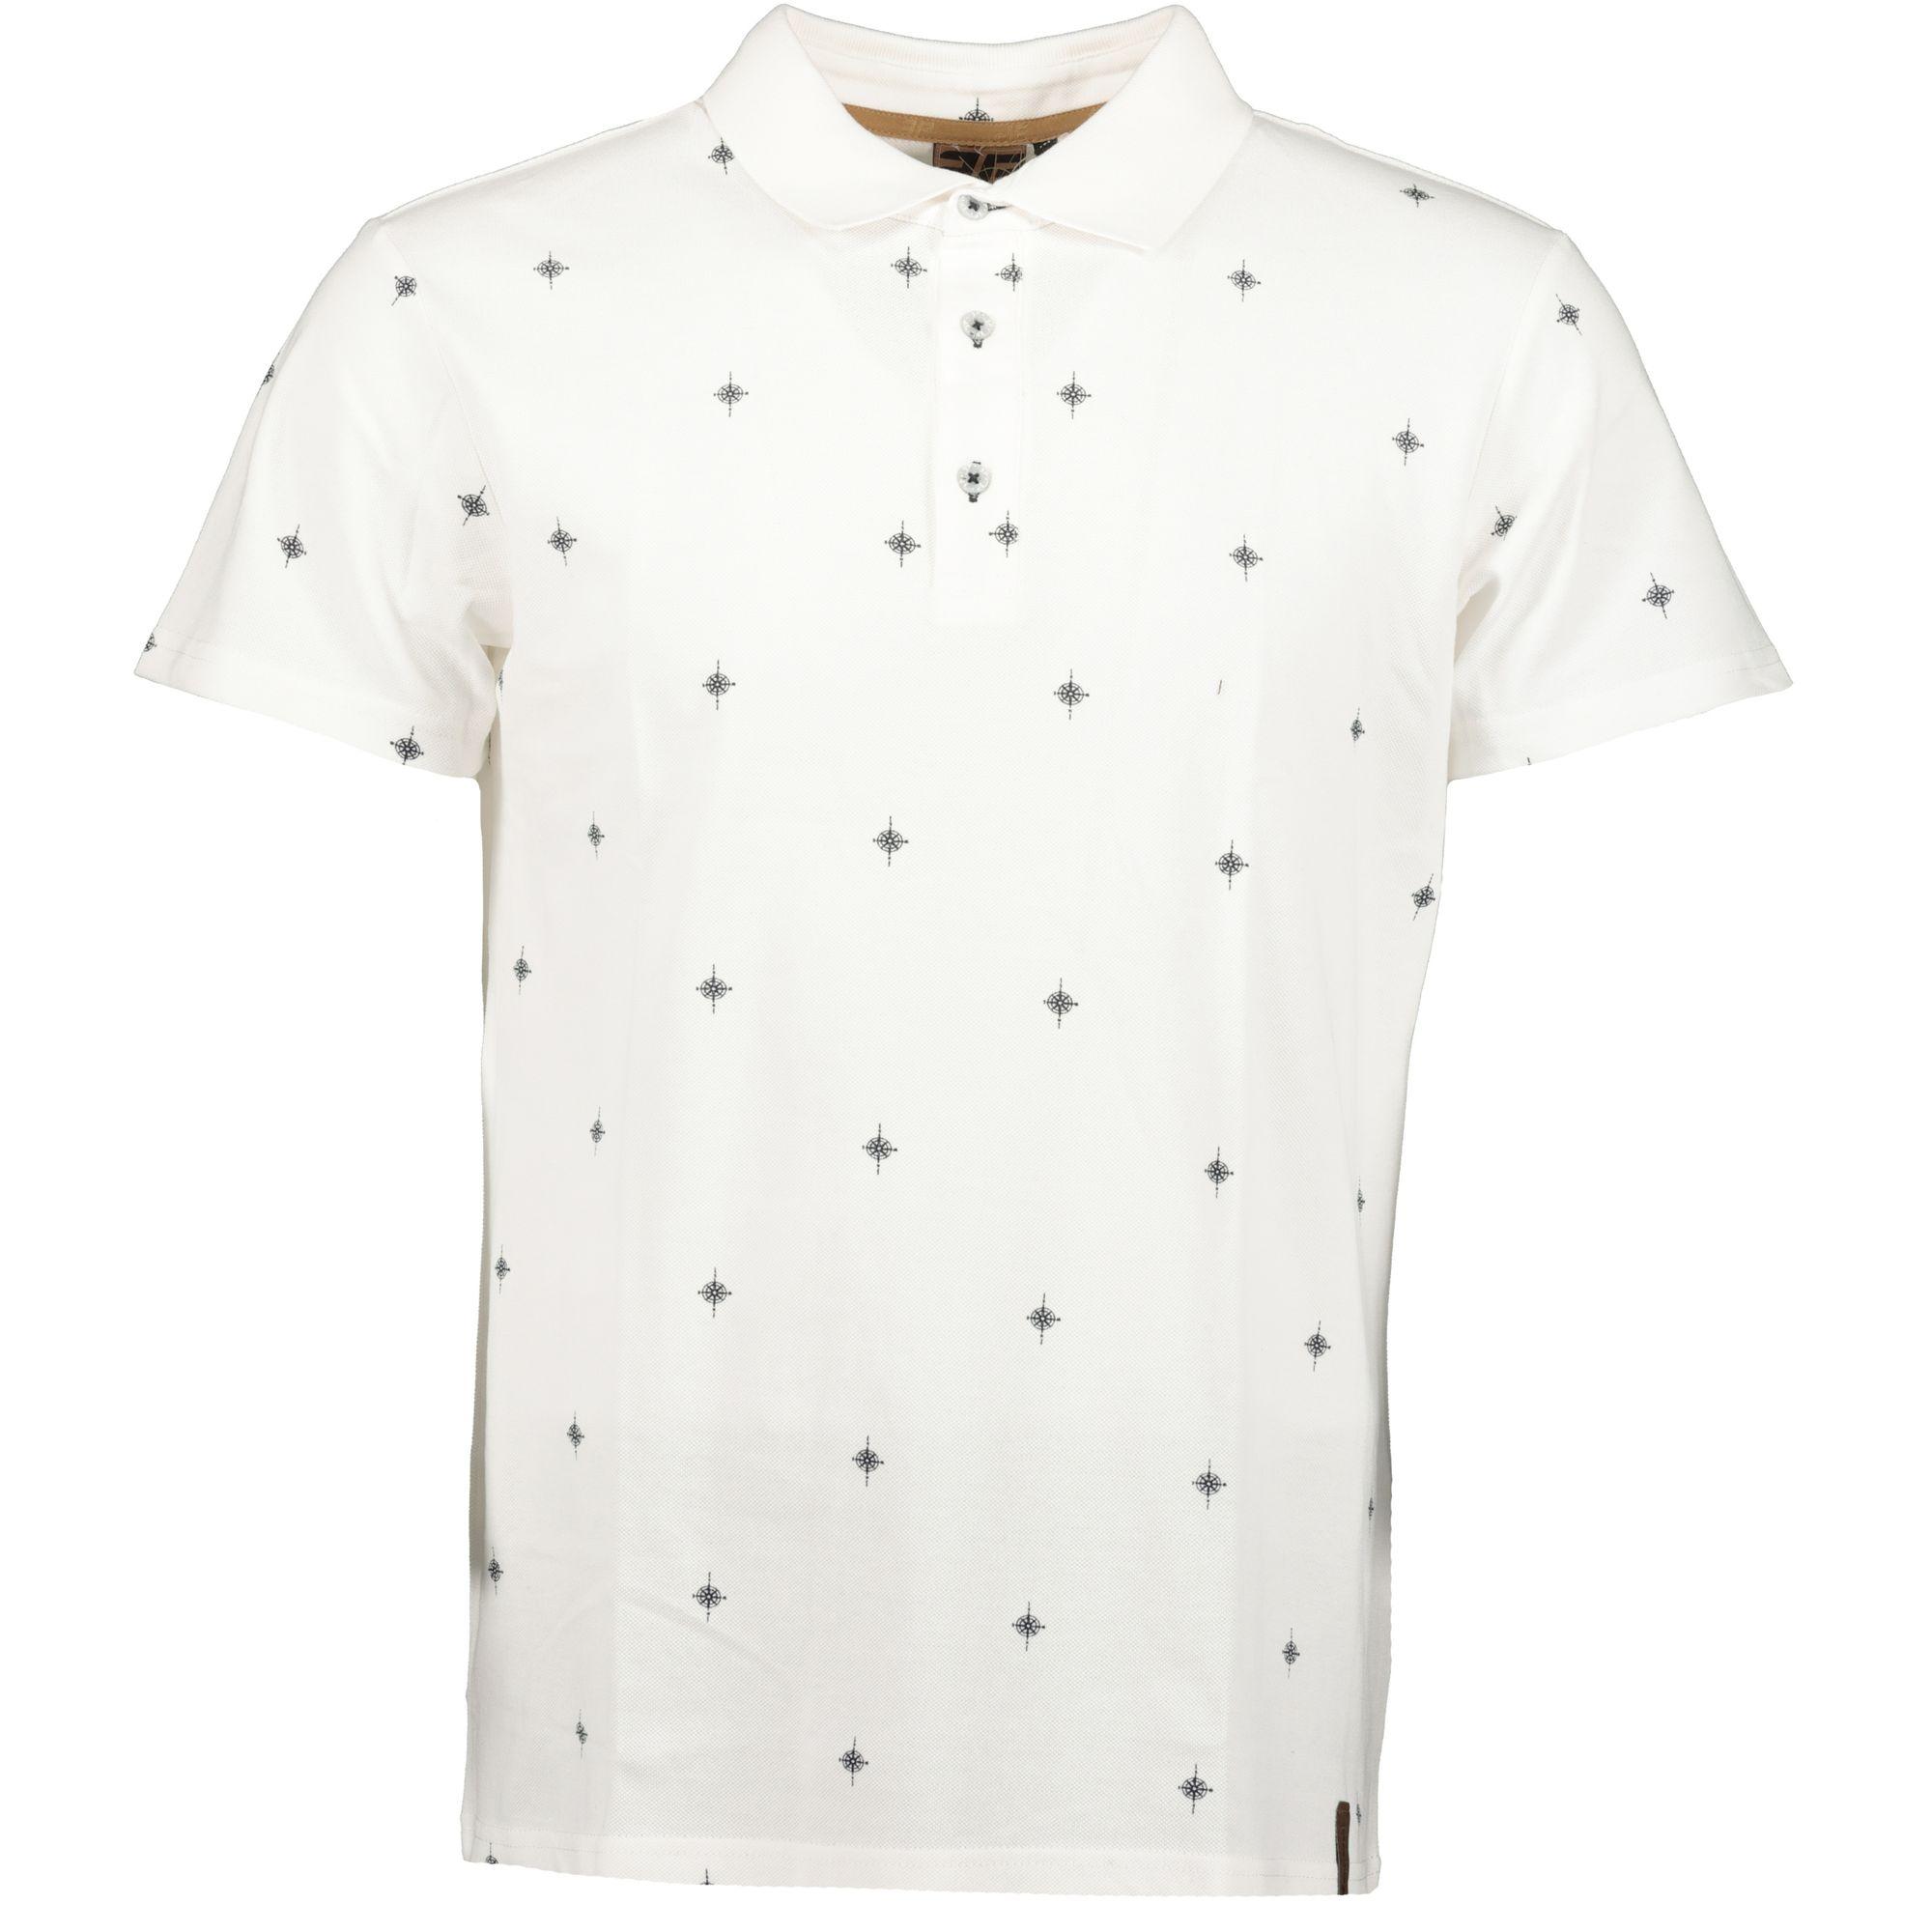 80a4c8f13d1b97 Icepeak Herren Polo Lorenzo Poloshirt Herren weiss Men Shirts Poloshirts